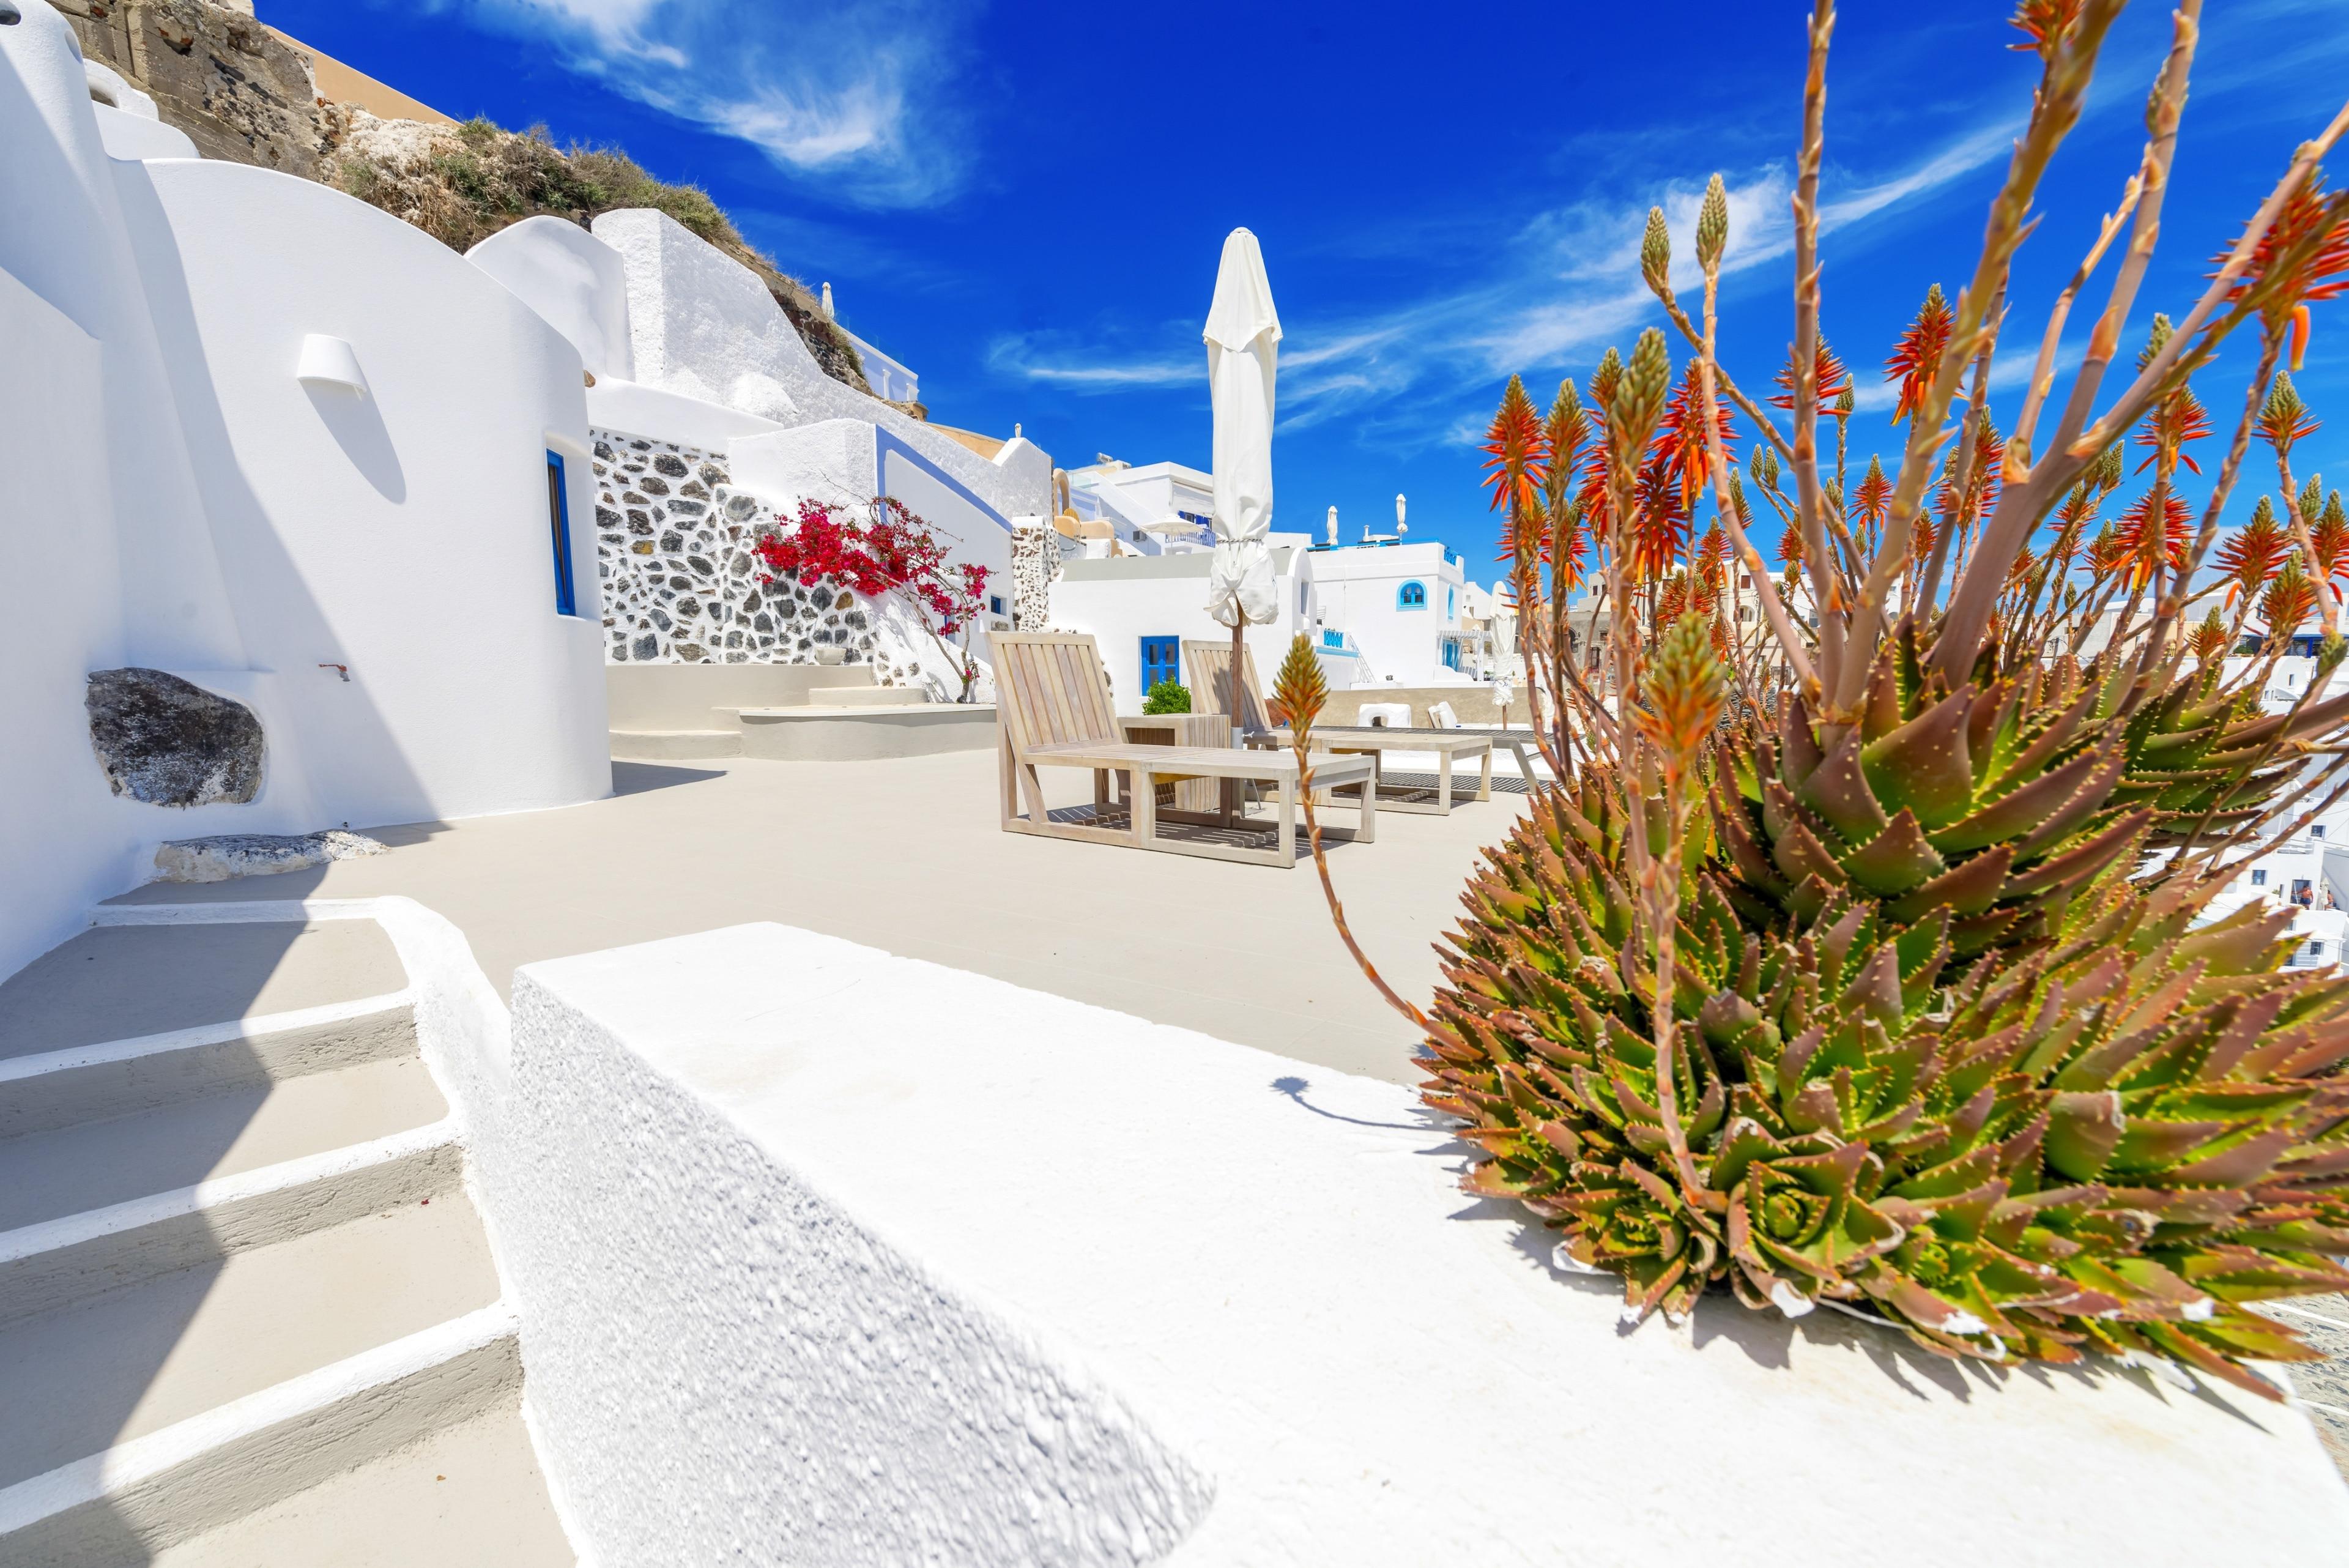 Imerovigli, Santorini, South Aegean, Greece